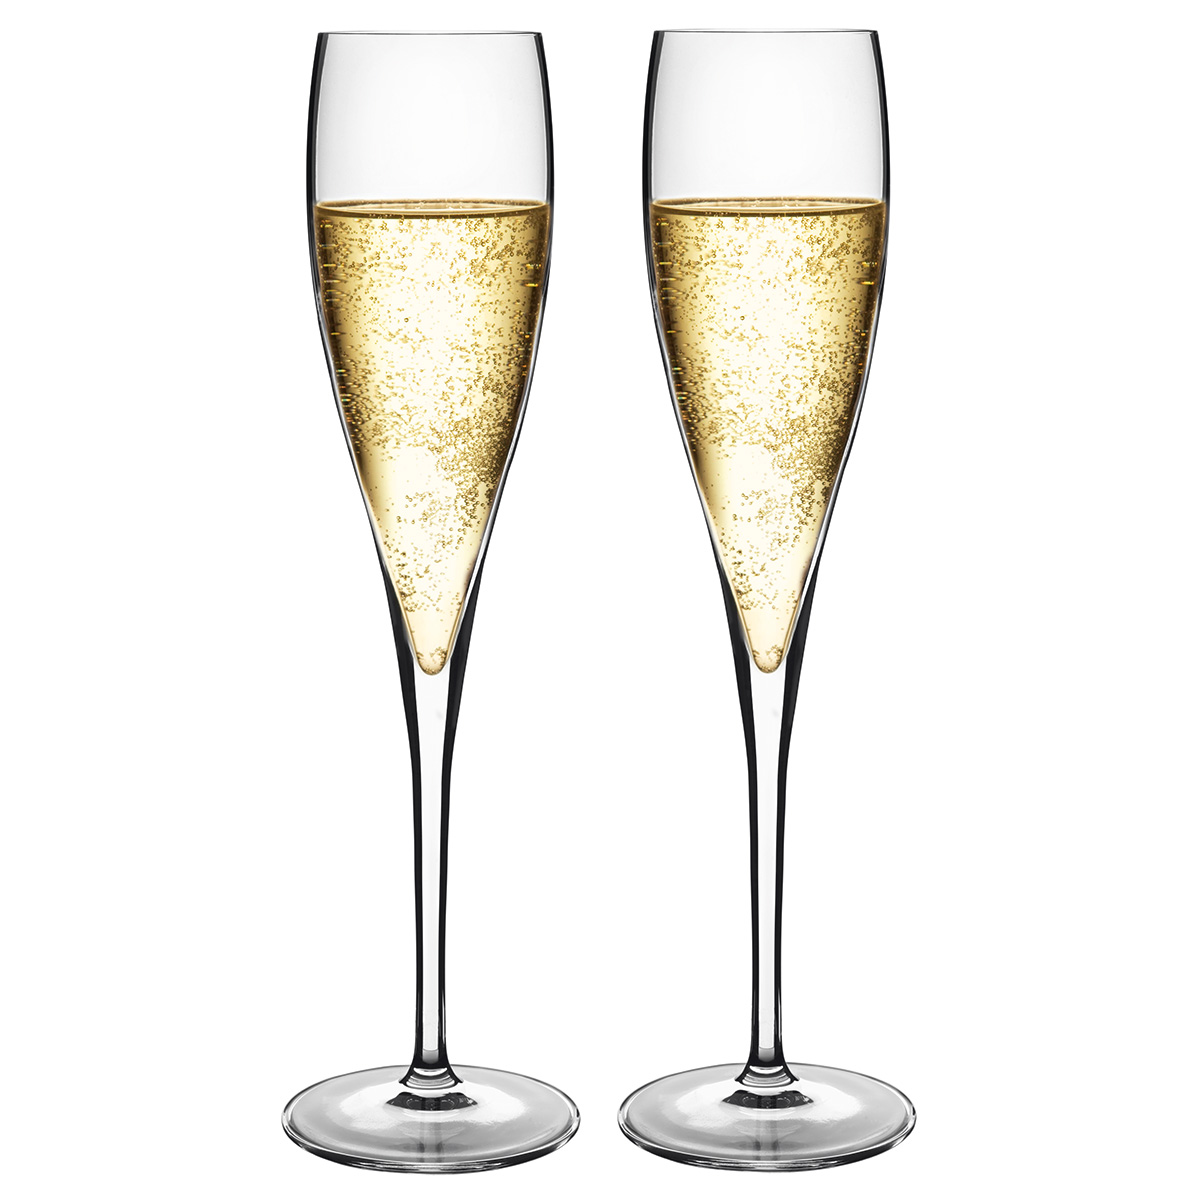 Image of   Luigi Bormioli champagneglas - Vinoteque - 2 stk.